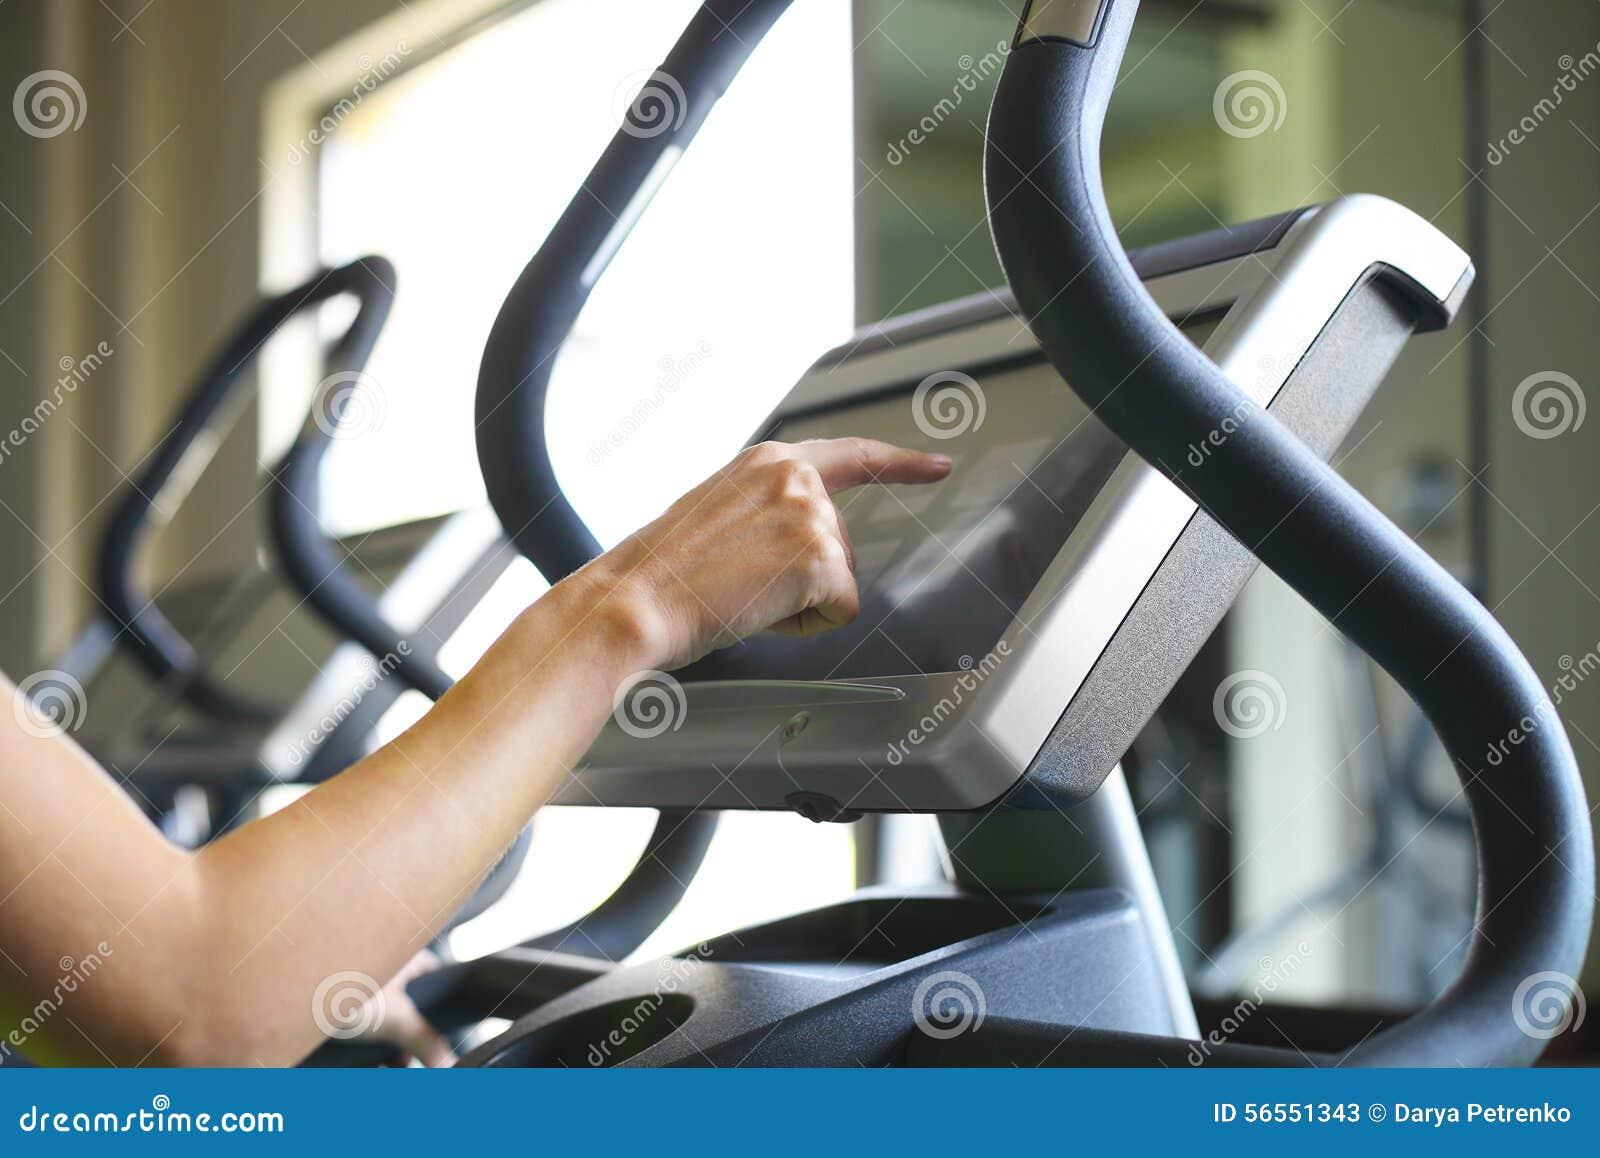 Download Νέες φίλαθλες γυναίκες που κάνουν τις ασκήσεις στο κέντρο γυμναστικής Στοκ Εικόνα - εικόνα από bodybuilders, πόδια: 56551343